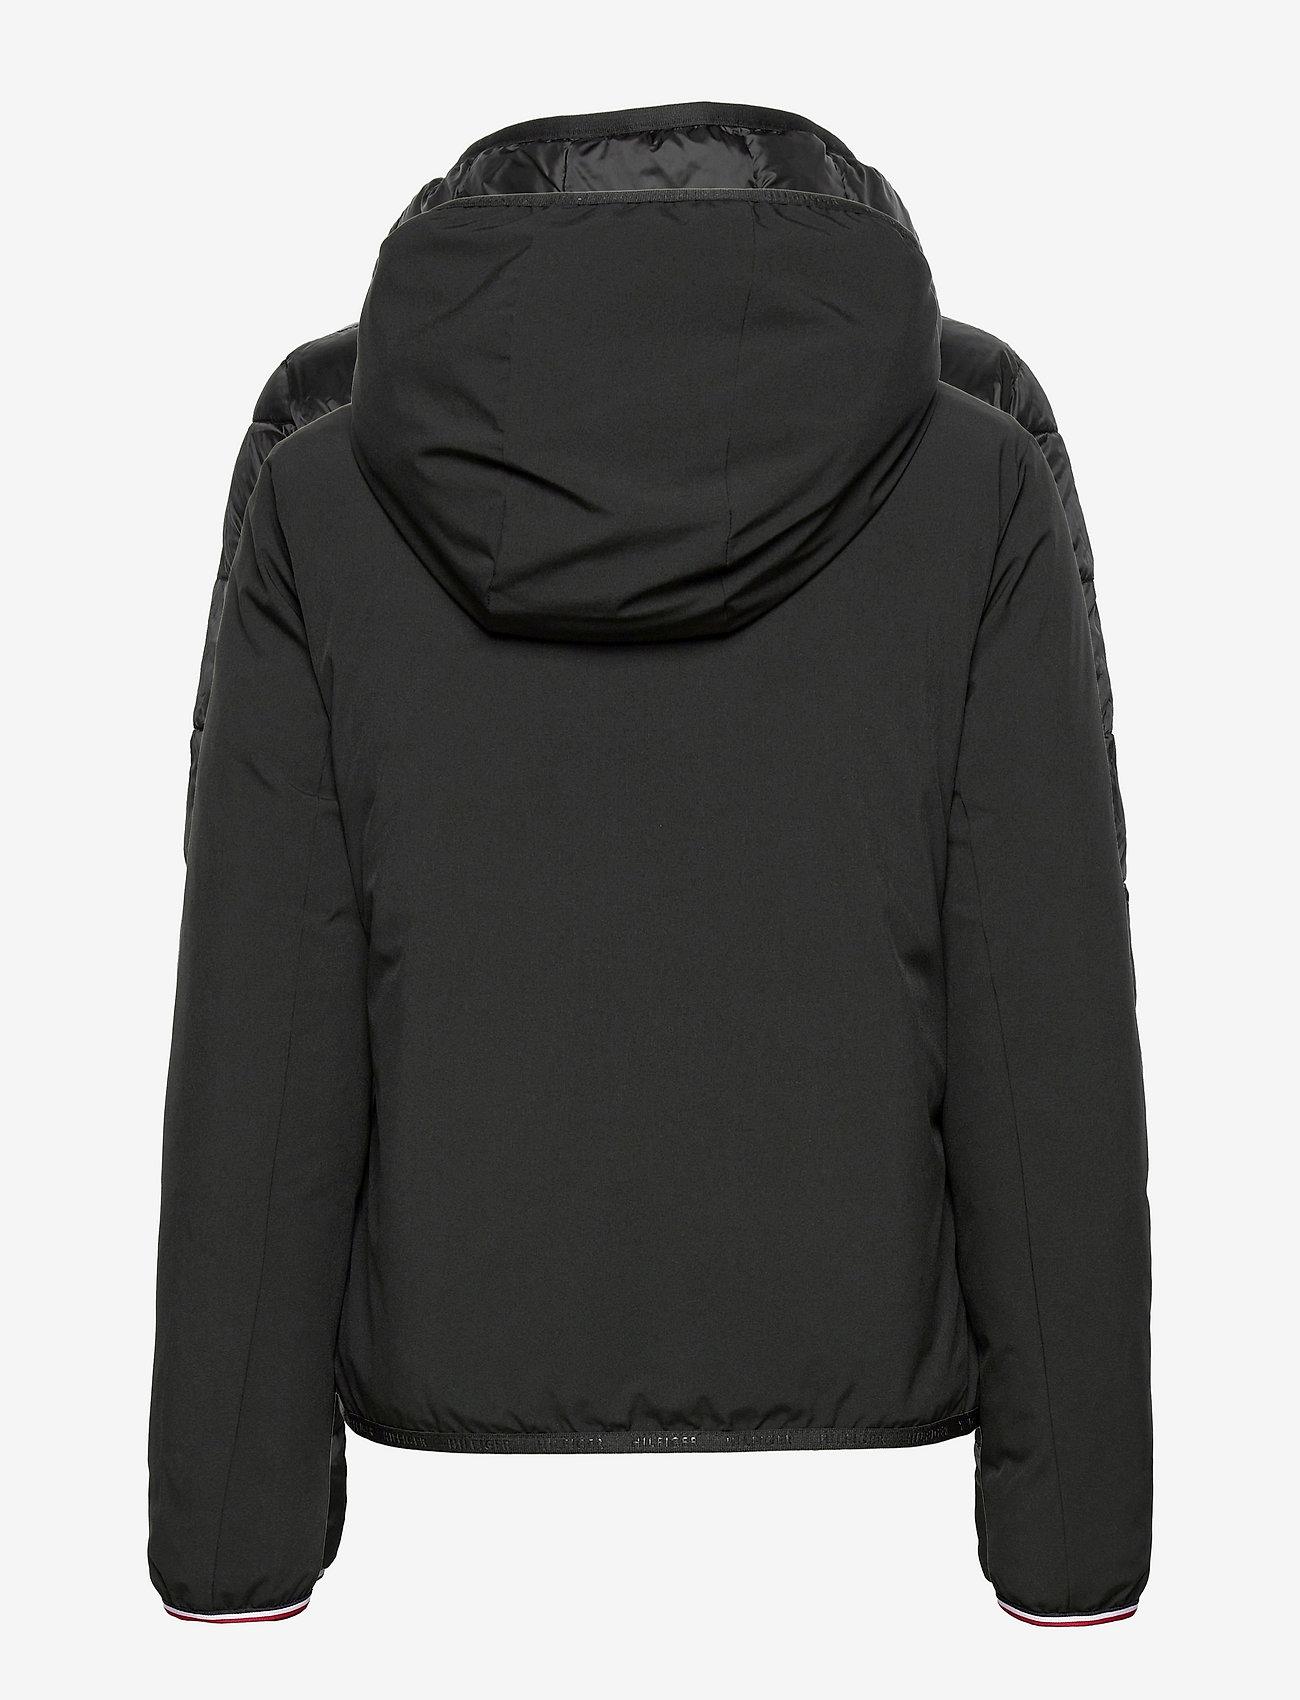 Tommy Hilfiger - TH ESS REVERSIBLE PADDED JACKET - winter jackets - black - 1